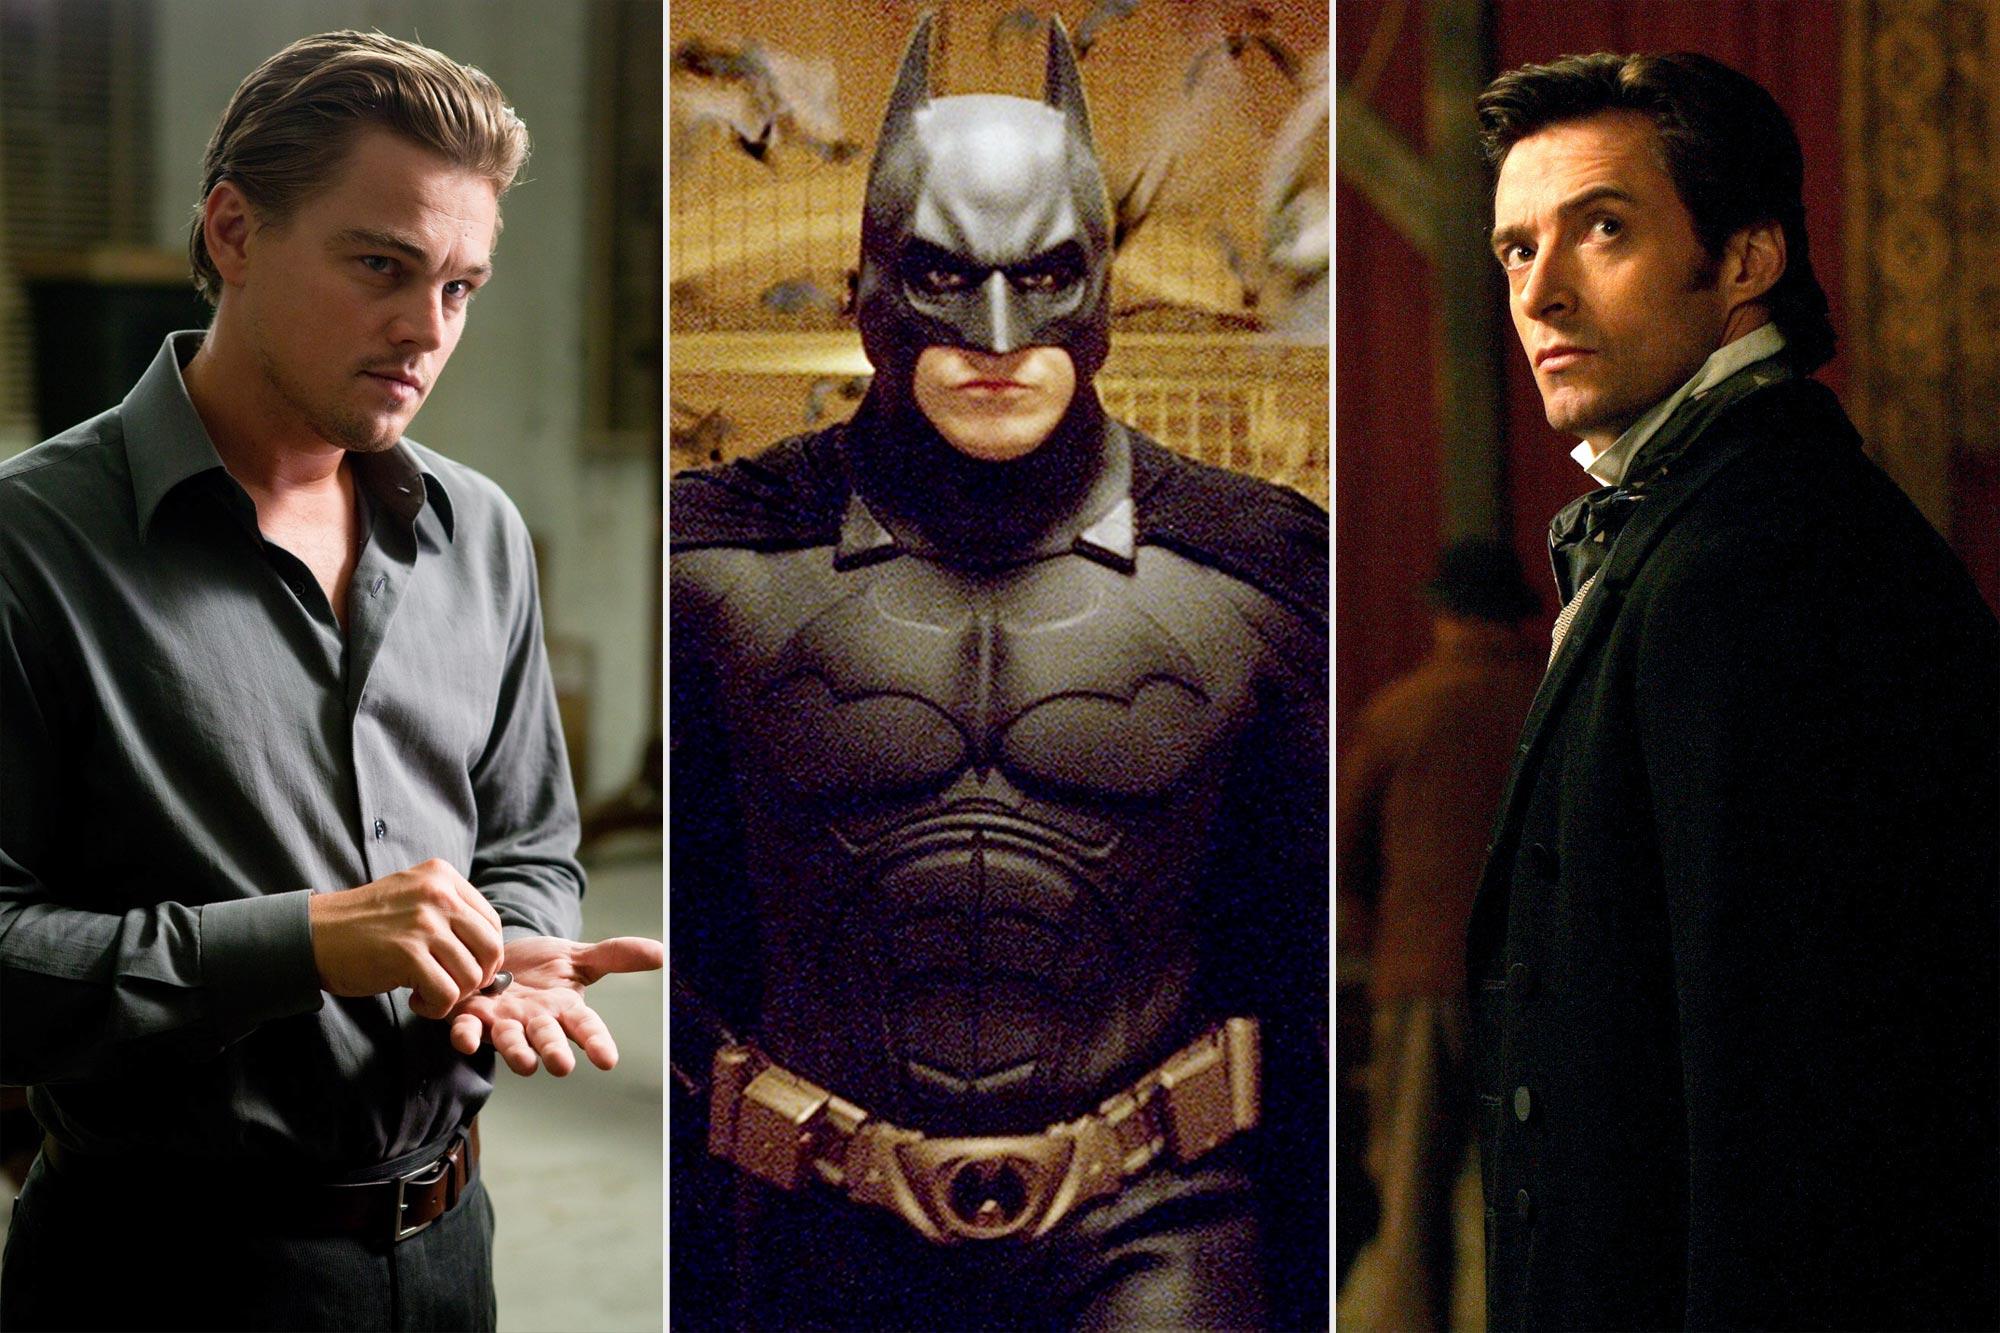 Christopher Nolan films